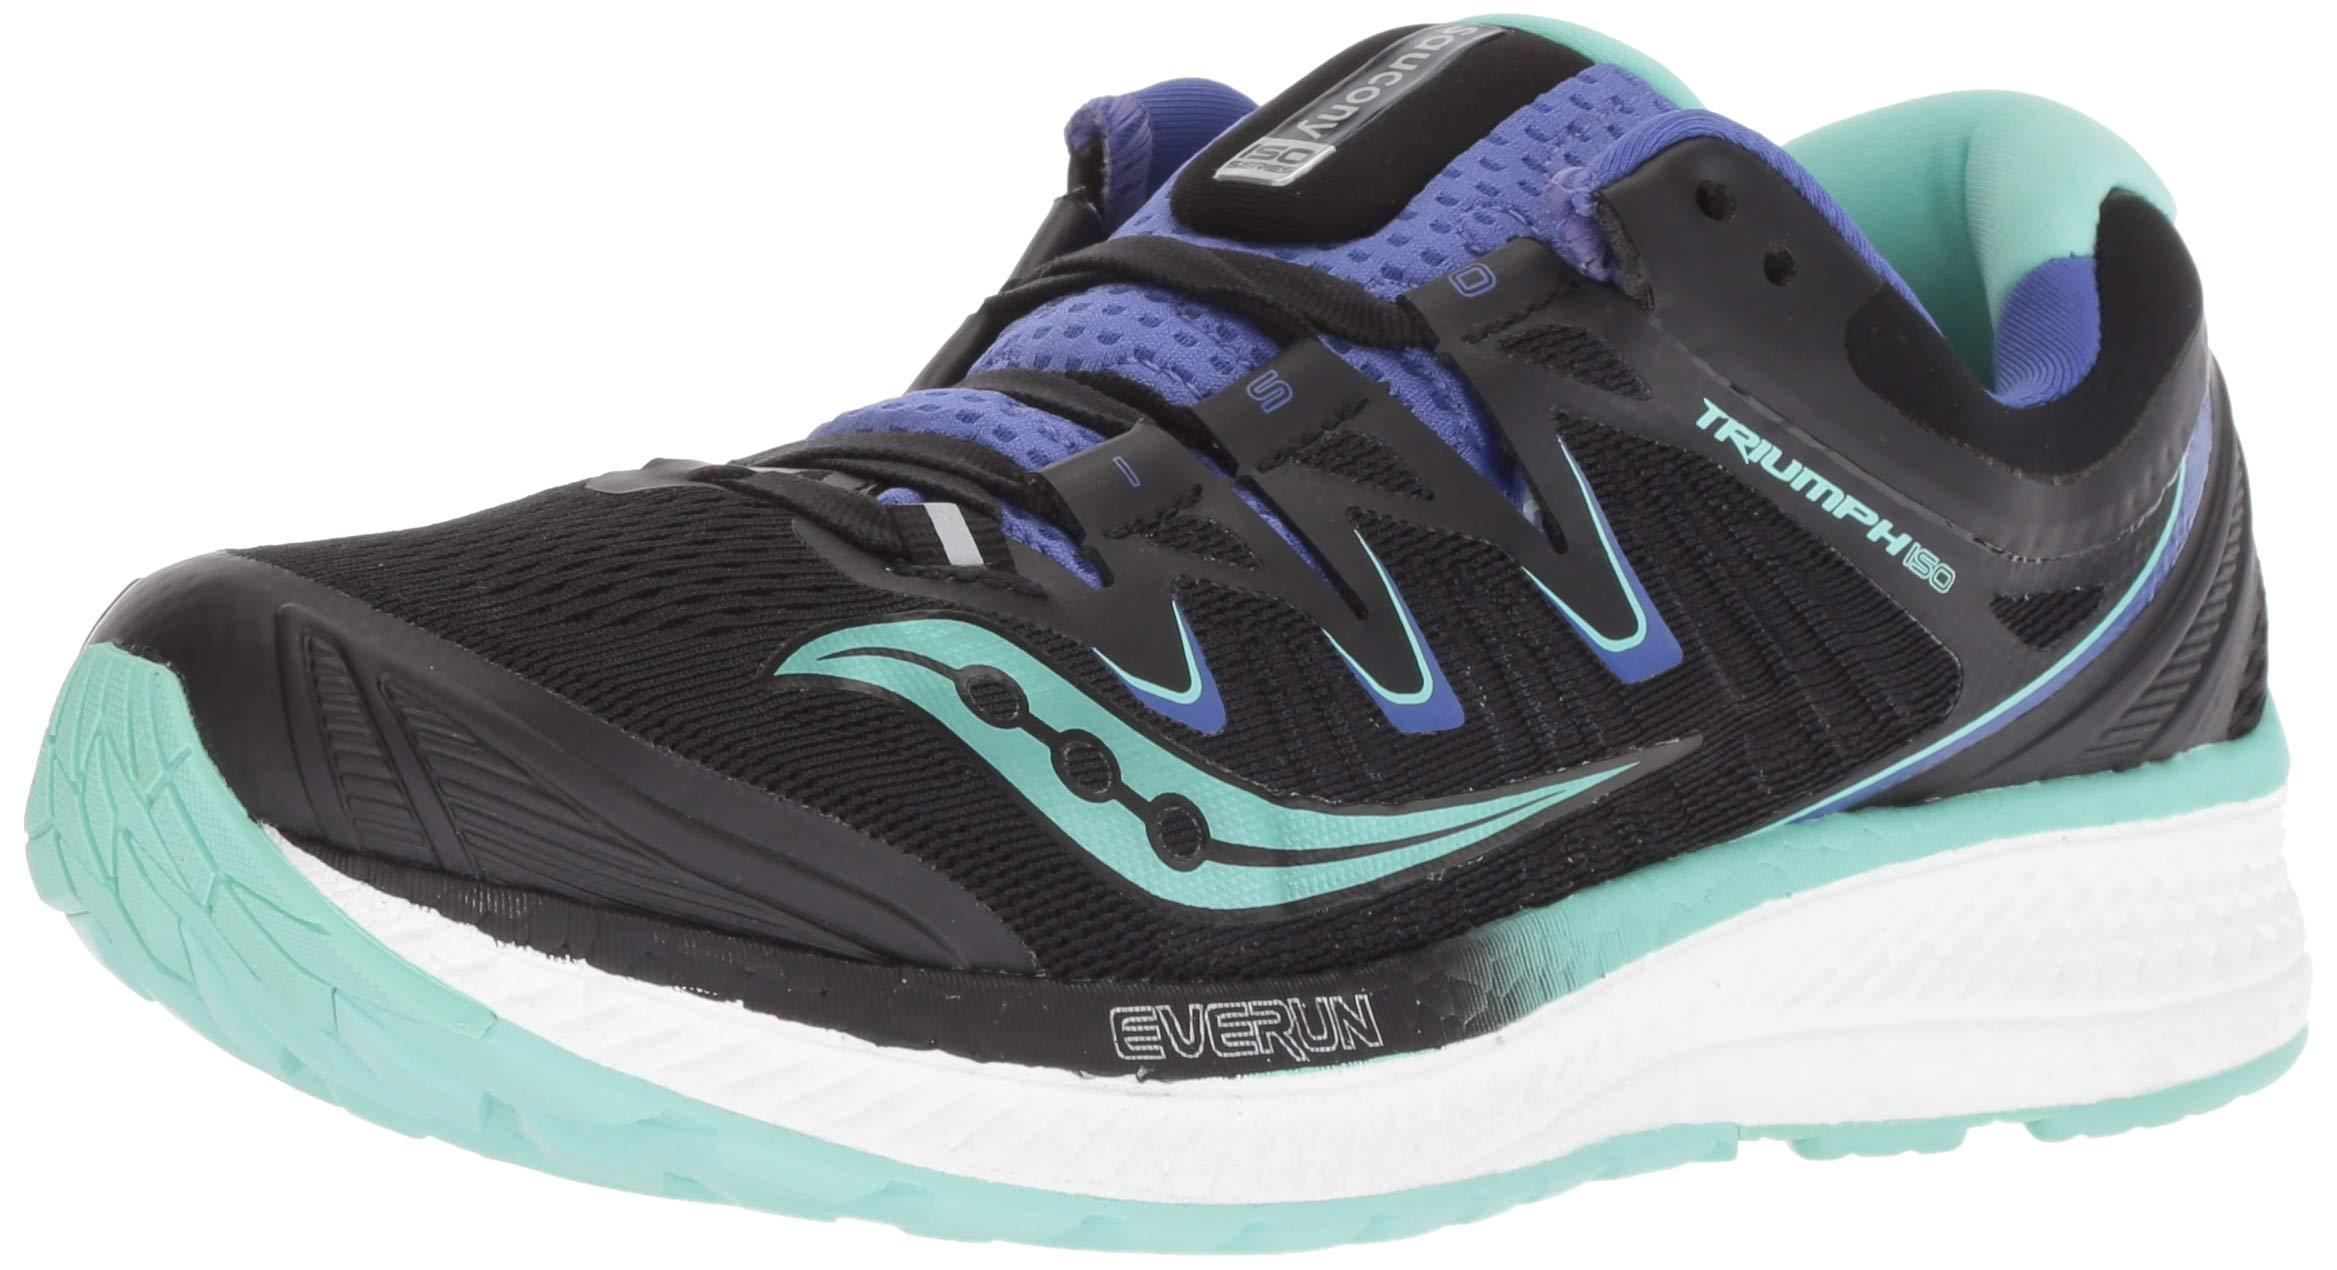 Saucony Women's Triumph ISO 4 Sneaker Black/Aqua/Violet 050 M US